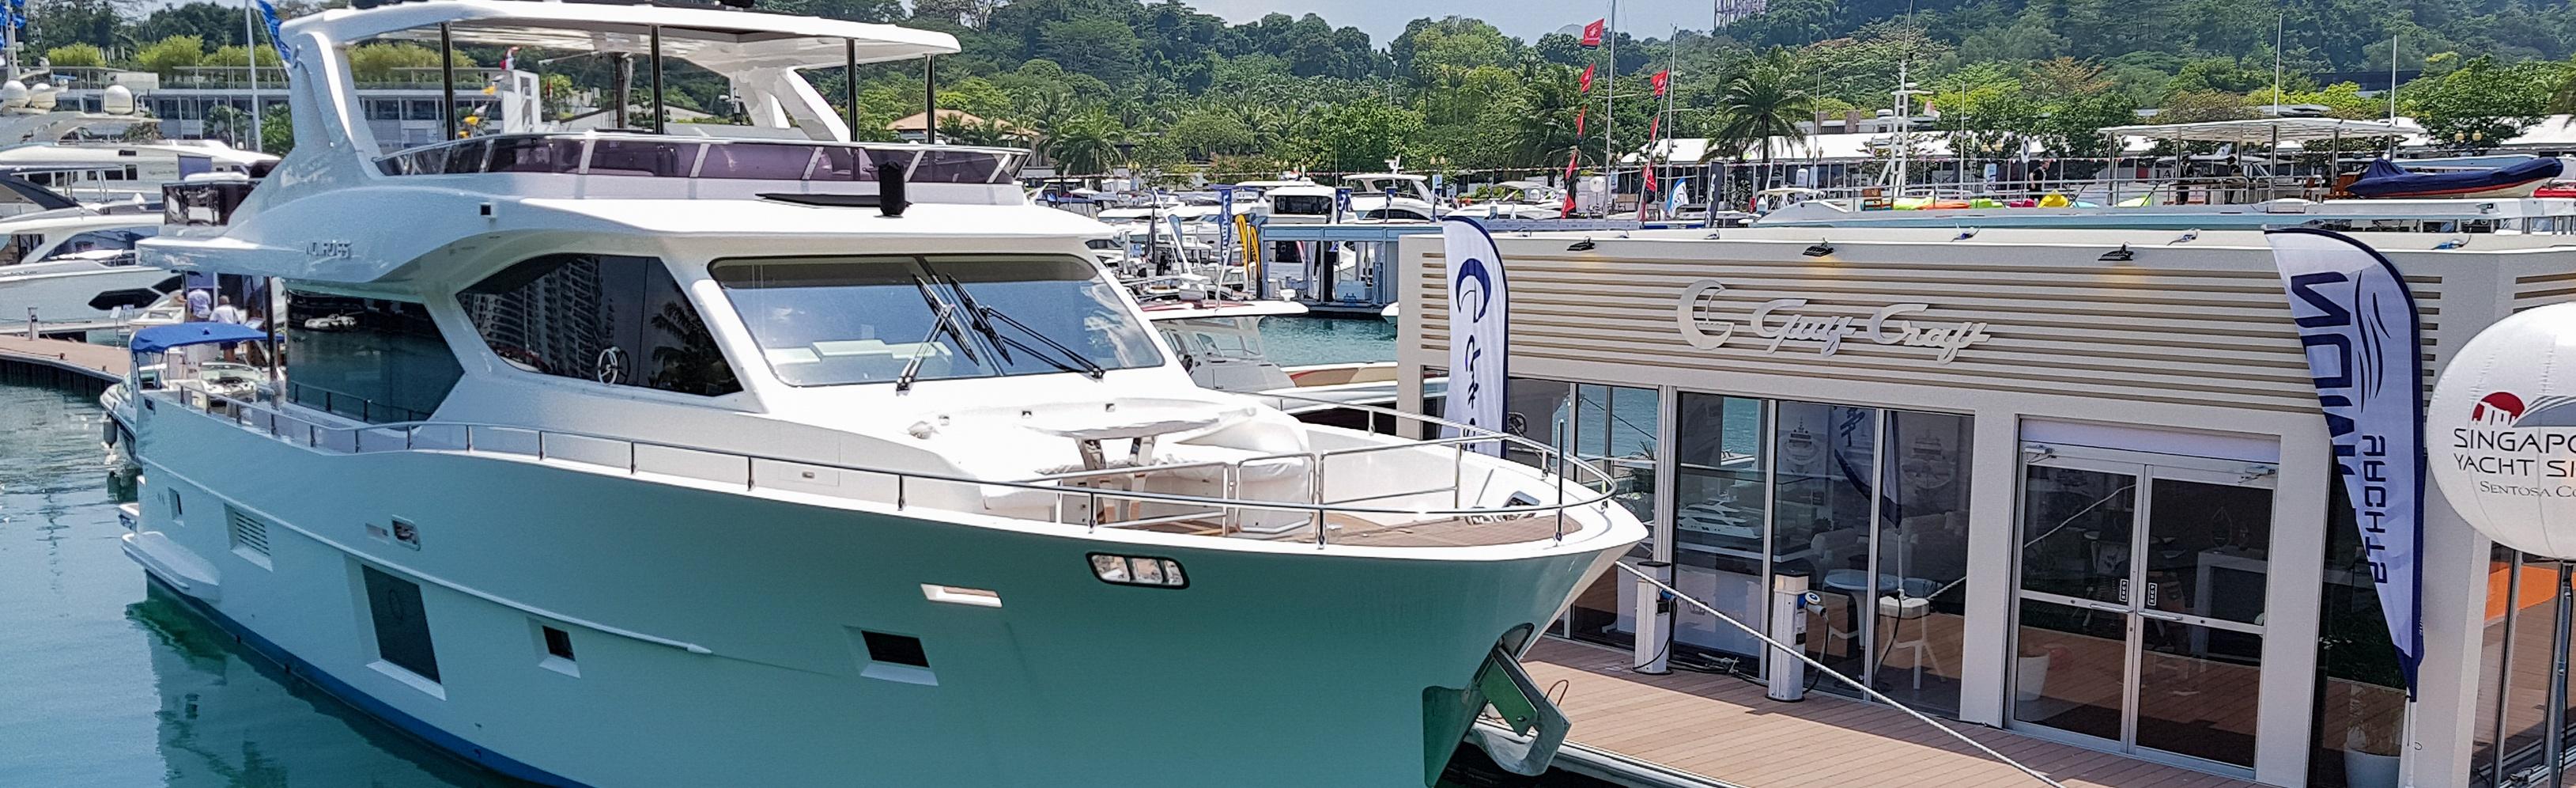 Gulf-Craft,-Singapore-Yacht-Show-2018